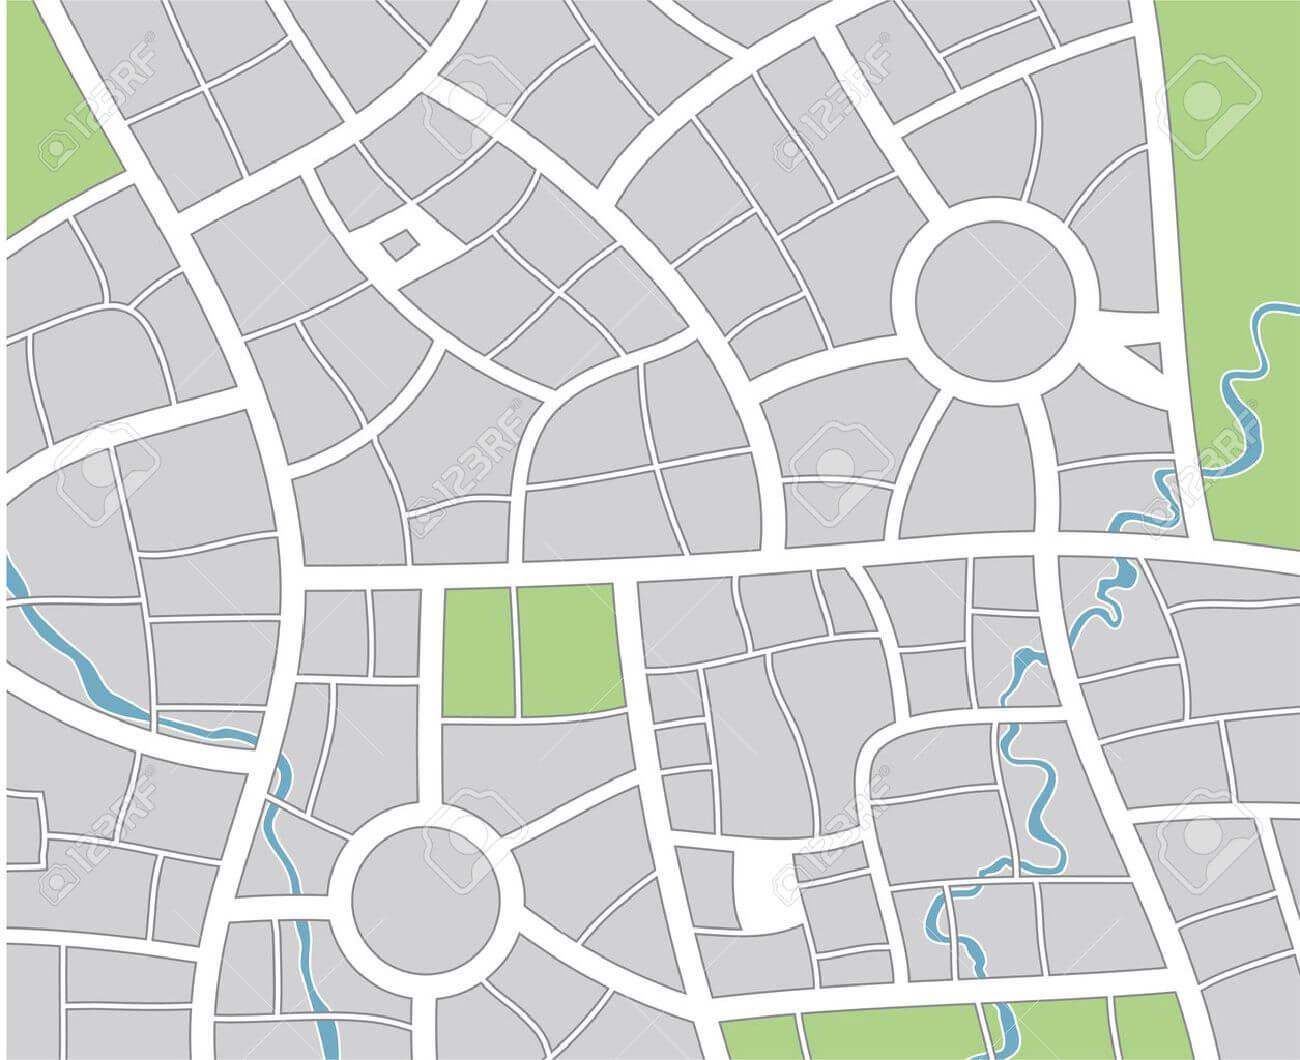 City Map Regarding Blank City Map Template